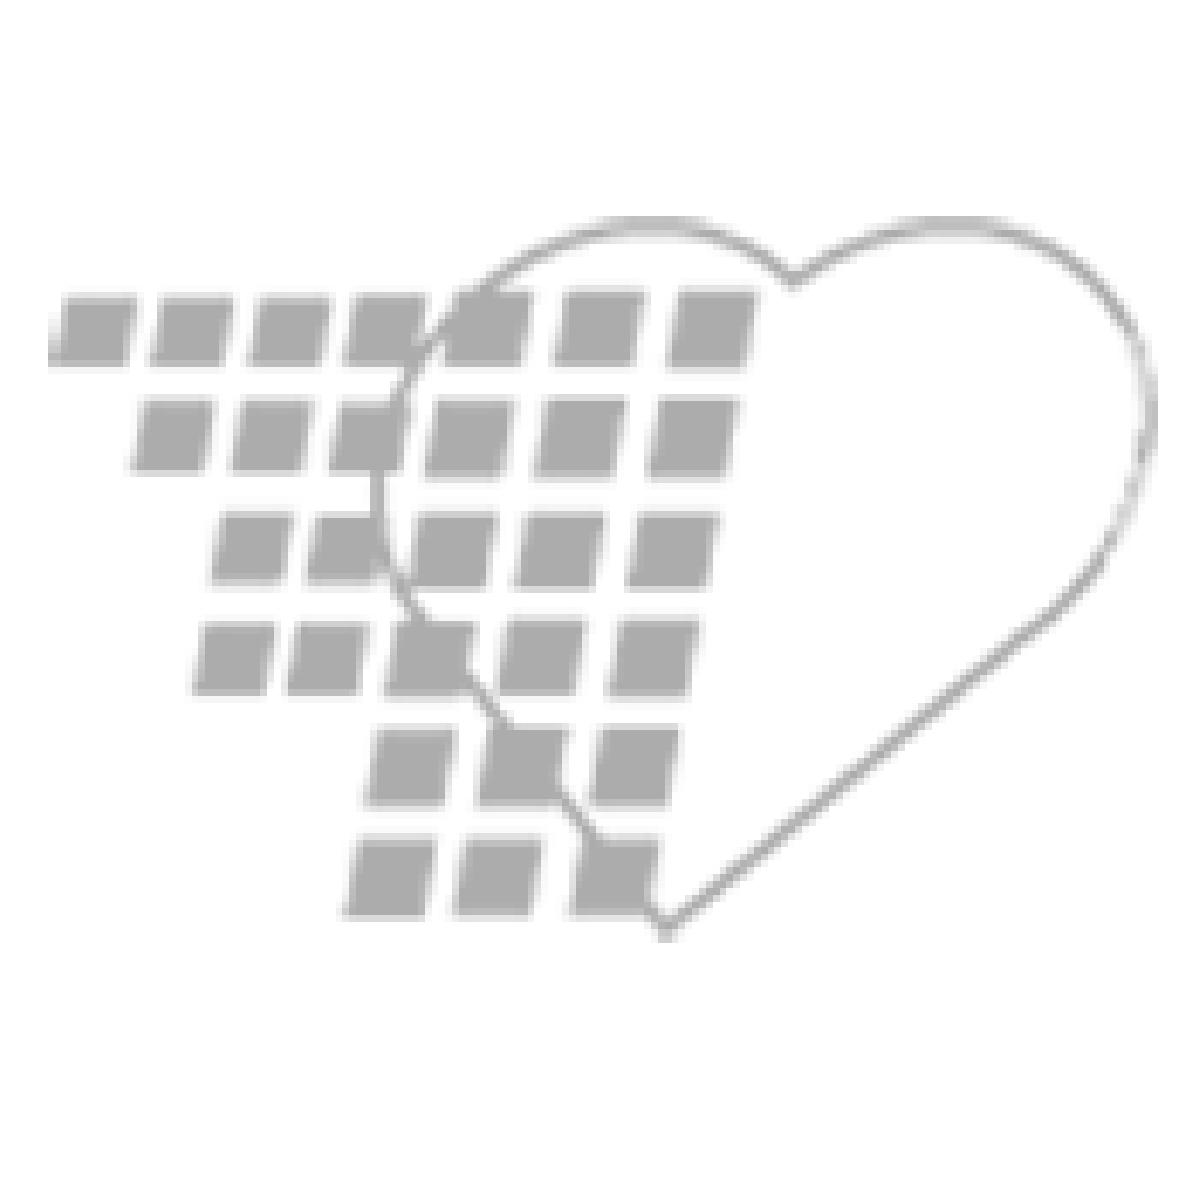 02-43-9000 - Three-Channel Wide-Screen ECG Interpretation